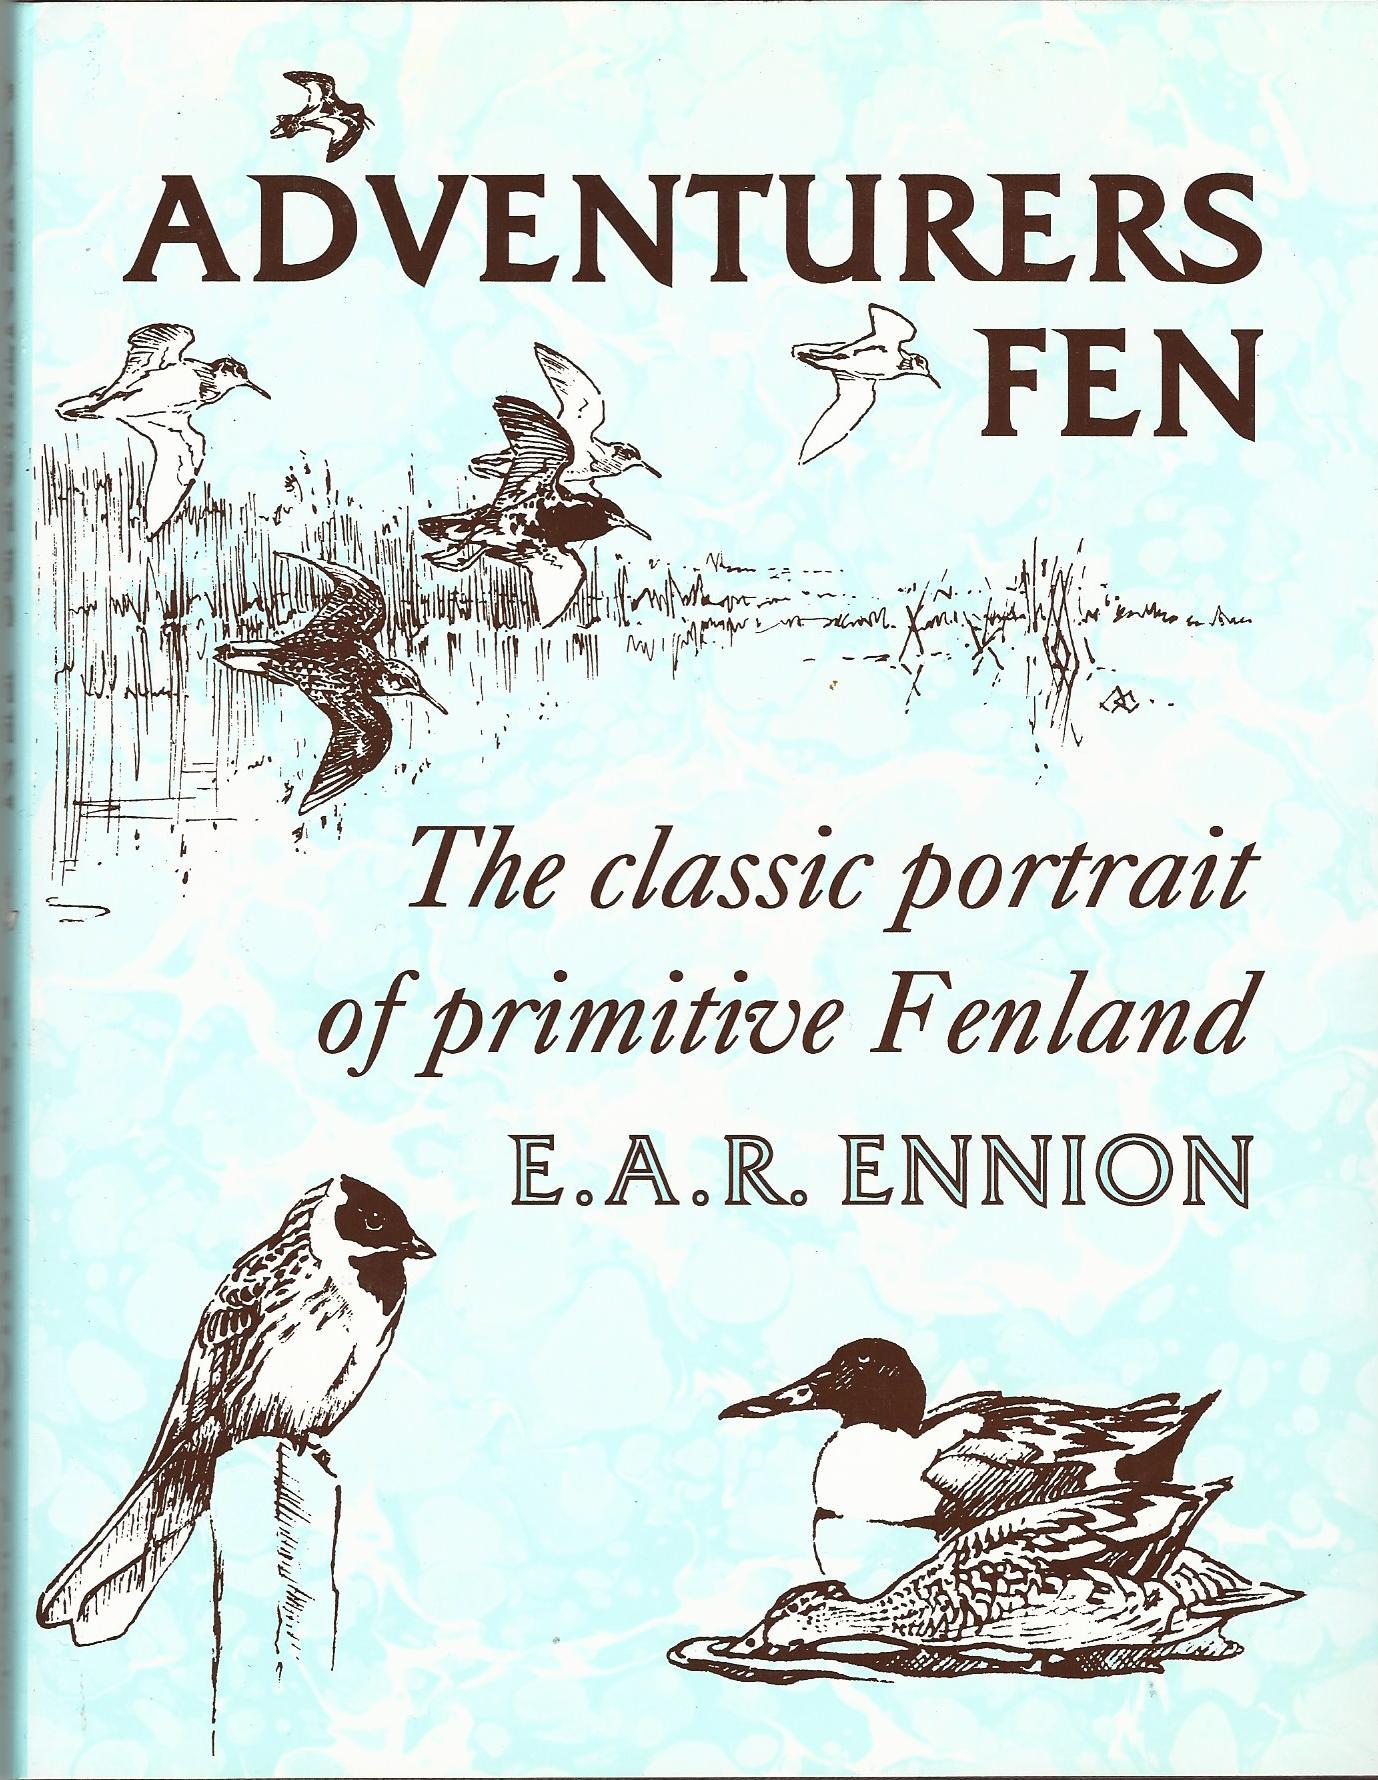 Adventurers Fen: The Classic Portrait of Primitive Fenland.